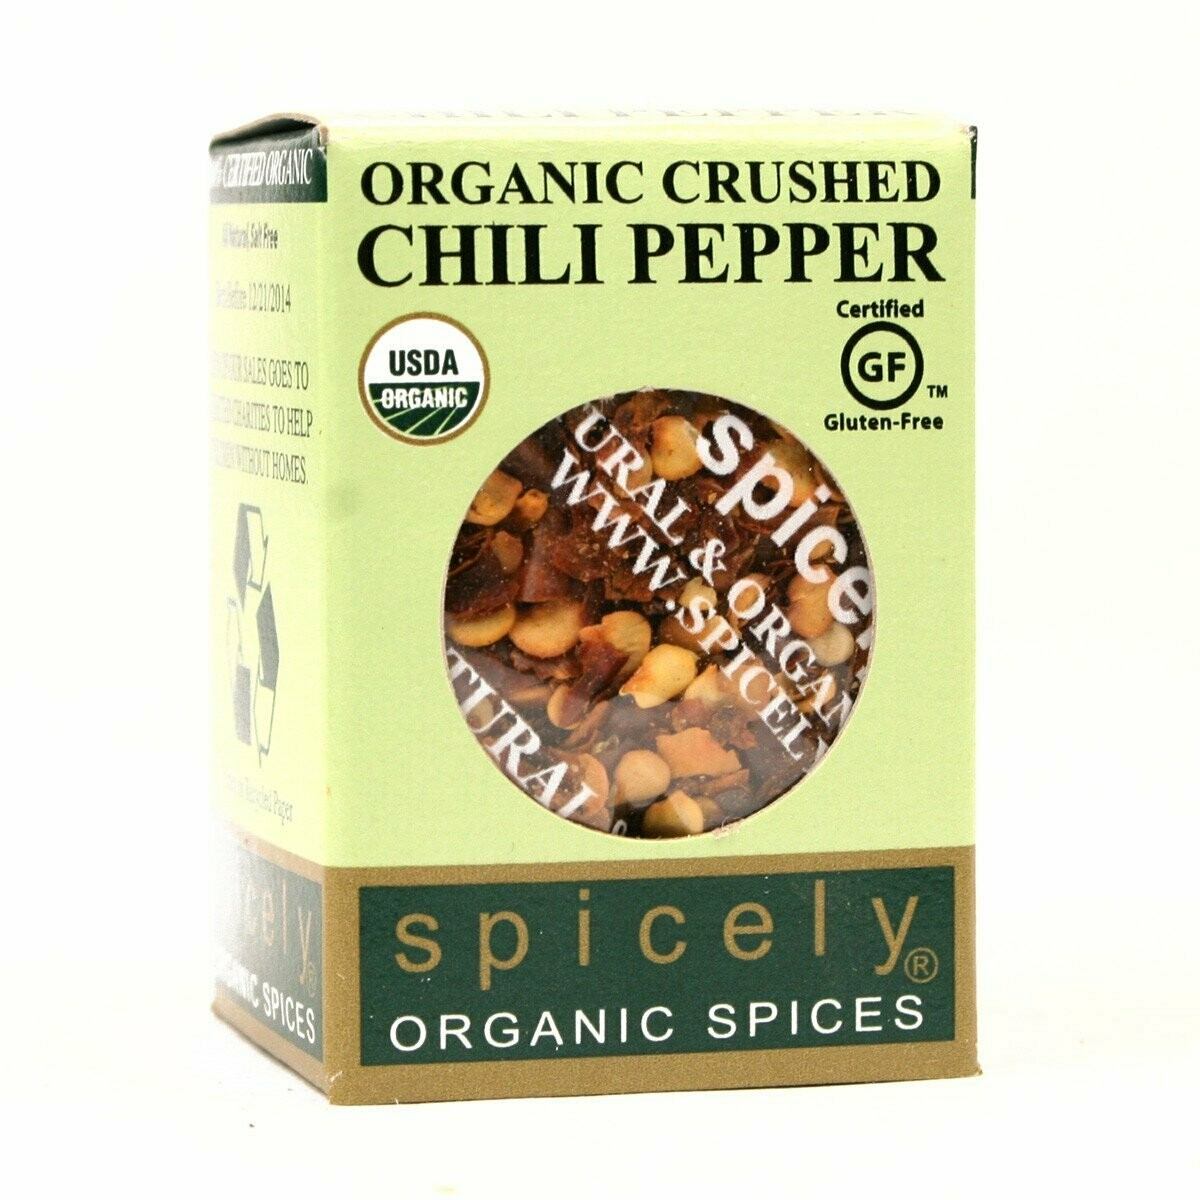 Organic Crushed Chili Pepper